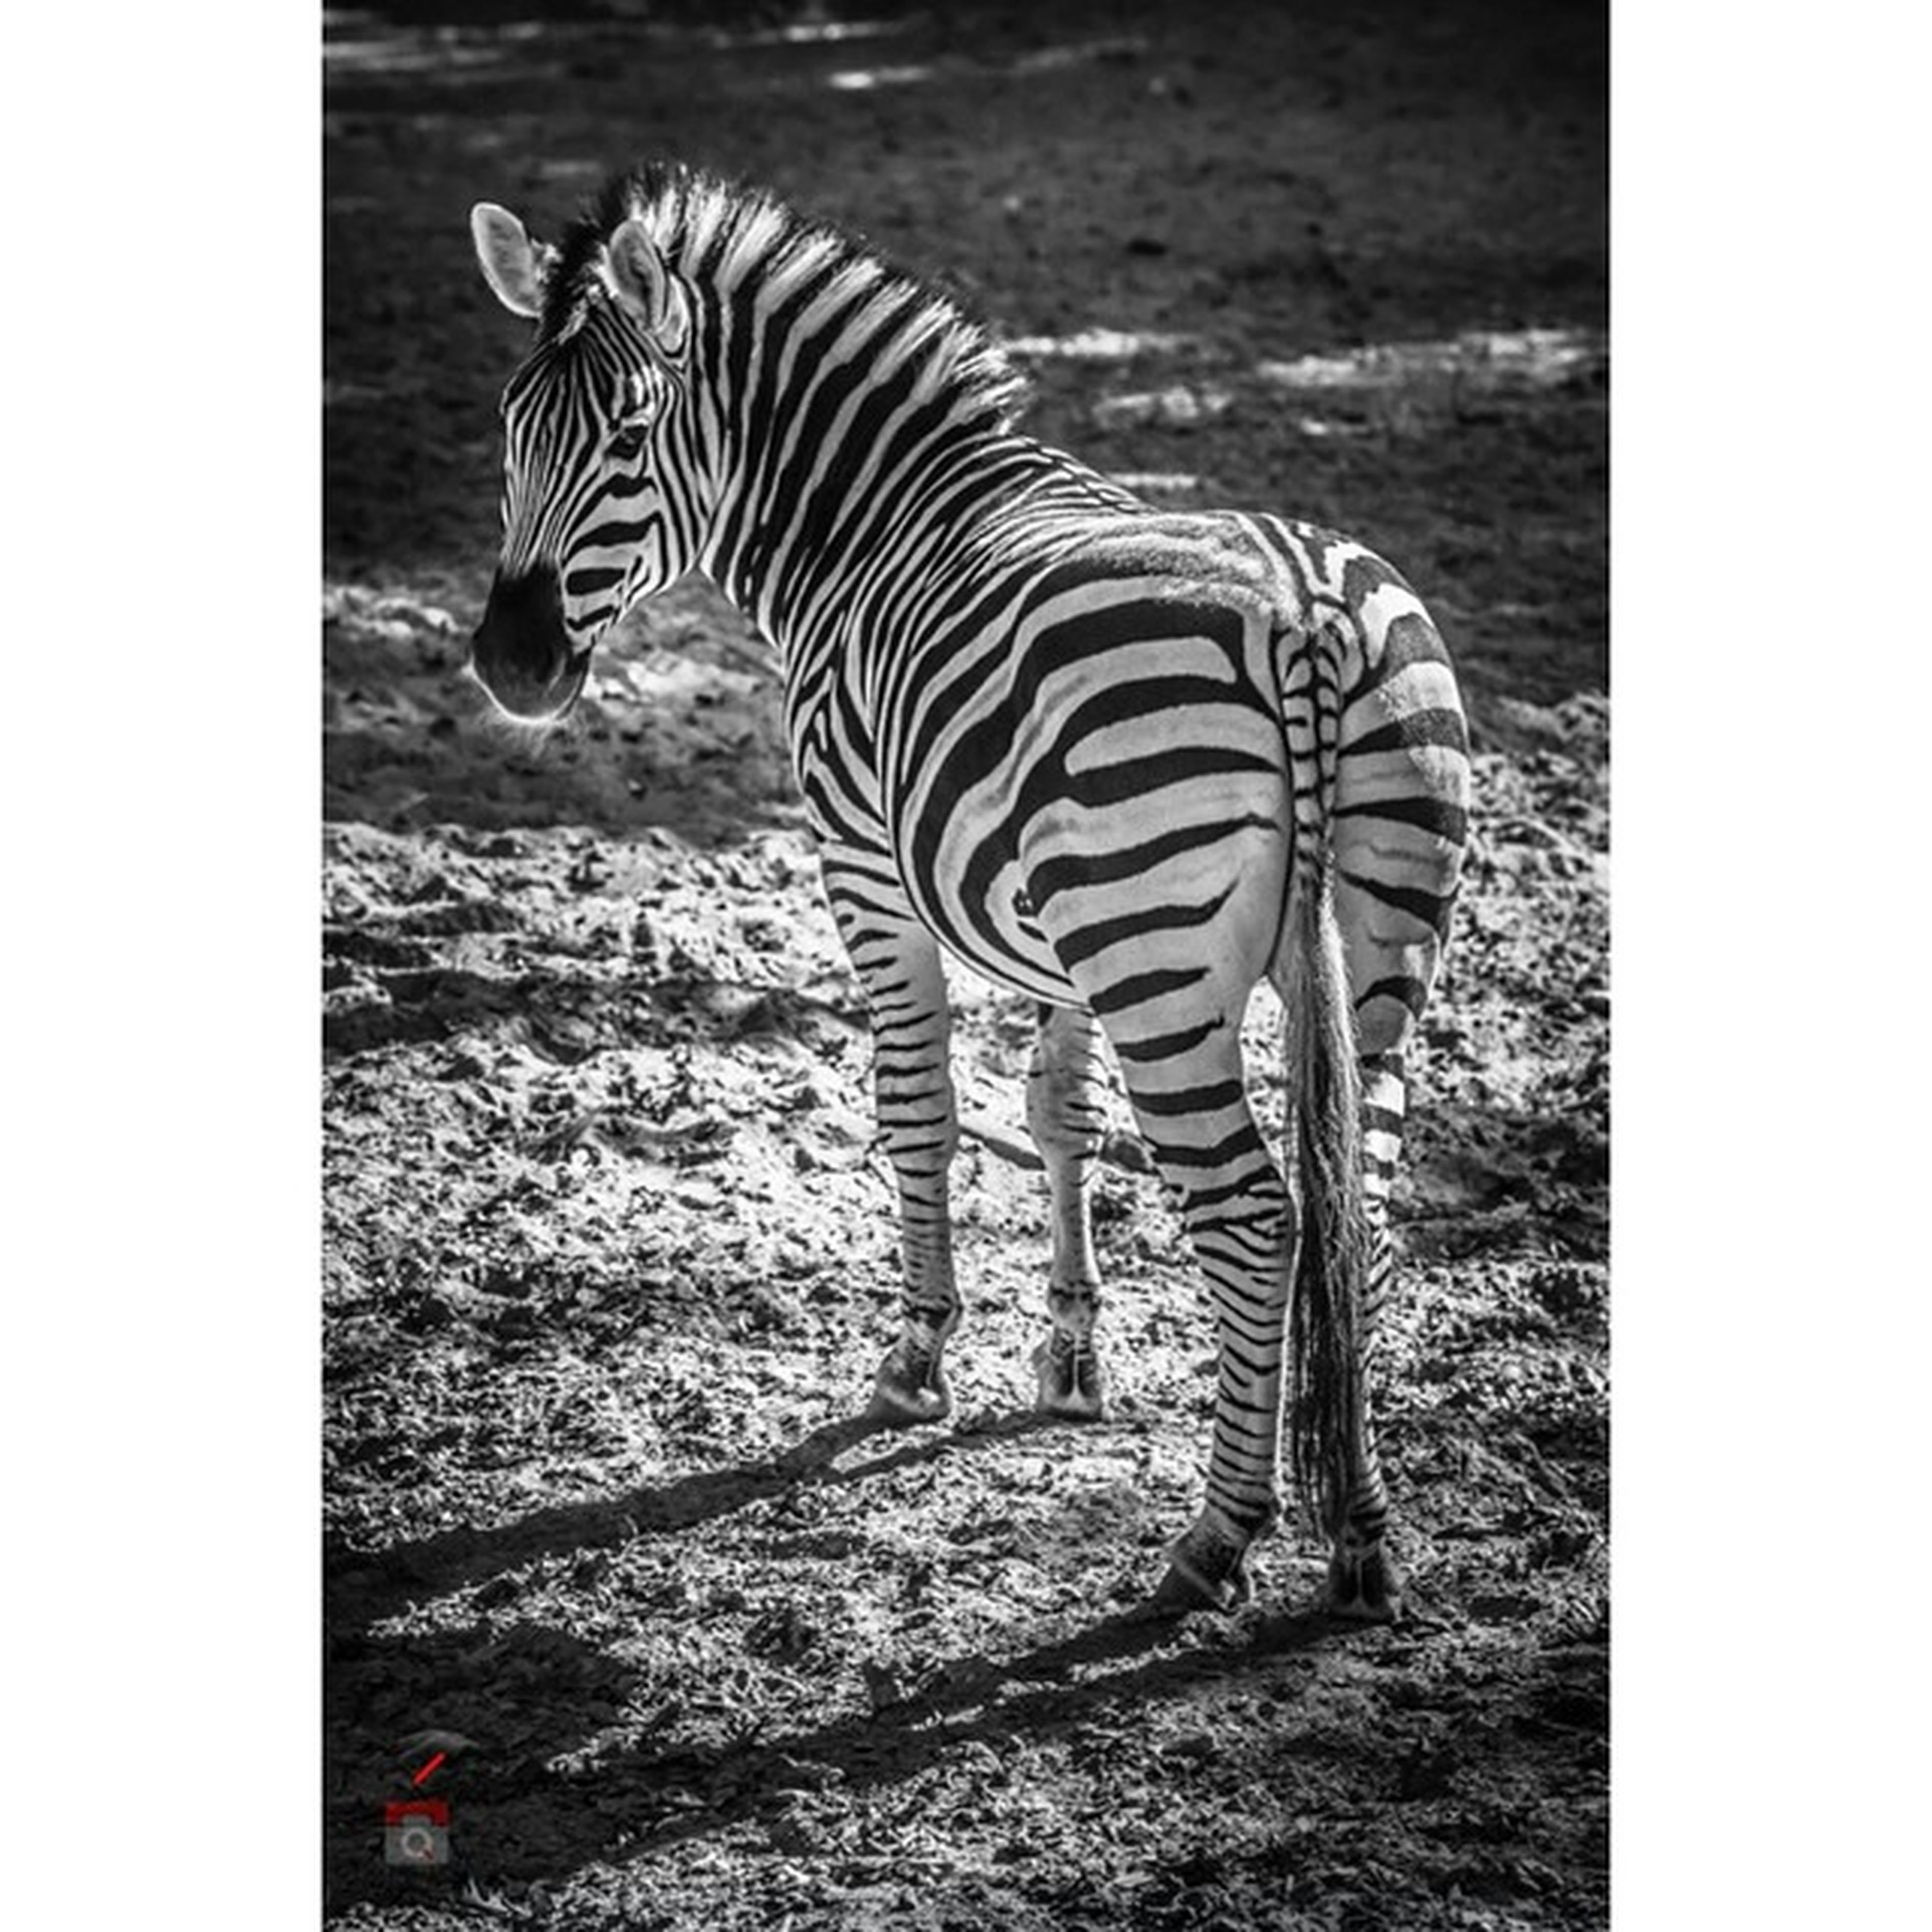 animal themes, transfer print, animals in the wild, wildlife, zebra, auto post production filter, one animal, safari animals, mammal, striped, standing, field, herbivorous, full length, nature, zoology, grazing, bird, animal markings, two animals